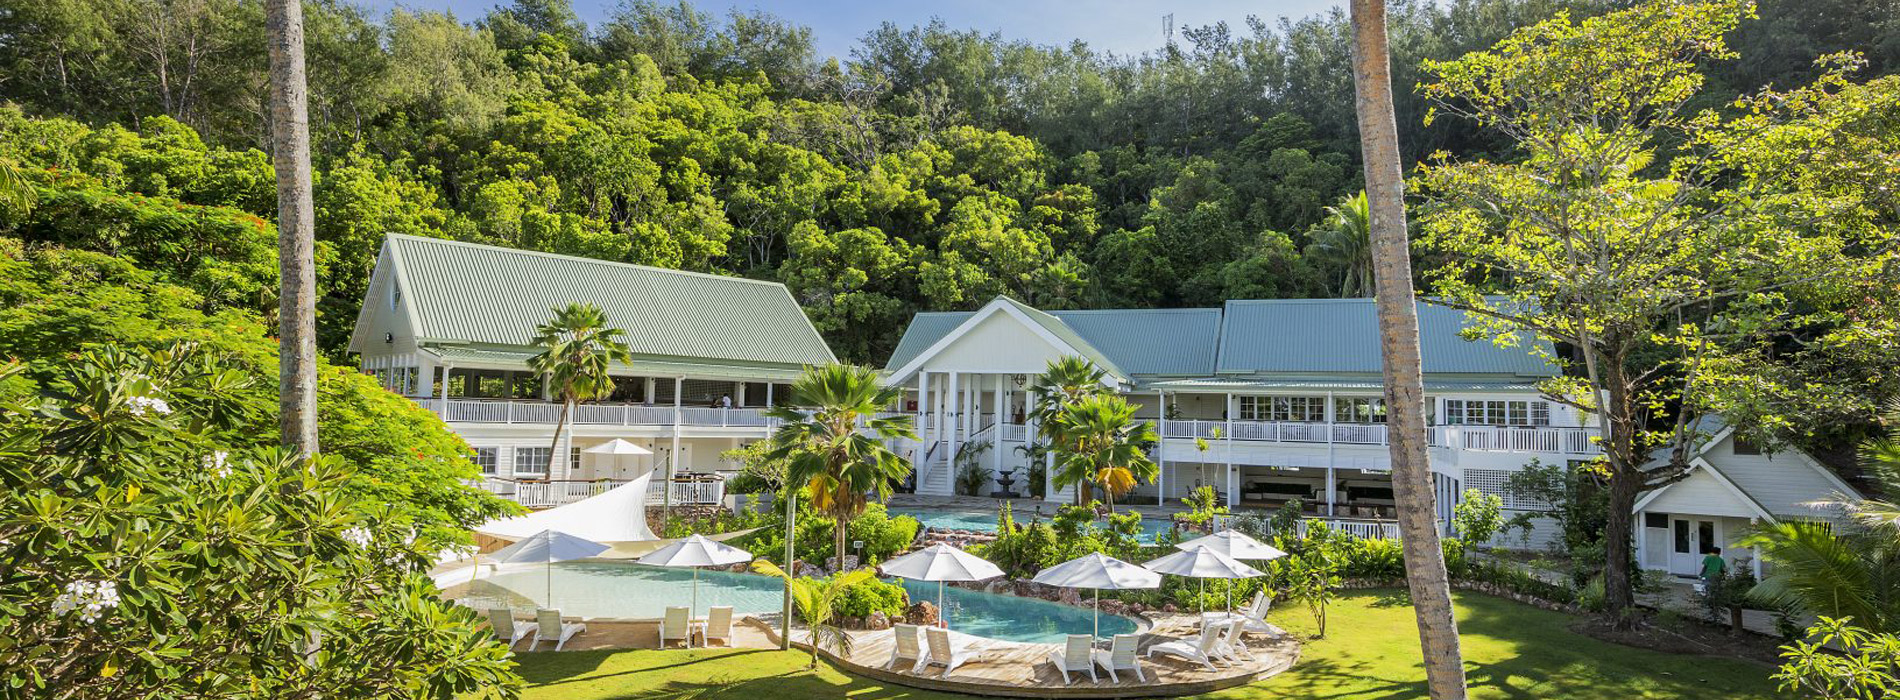 fiji resort review malolo island resort